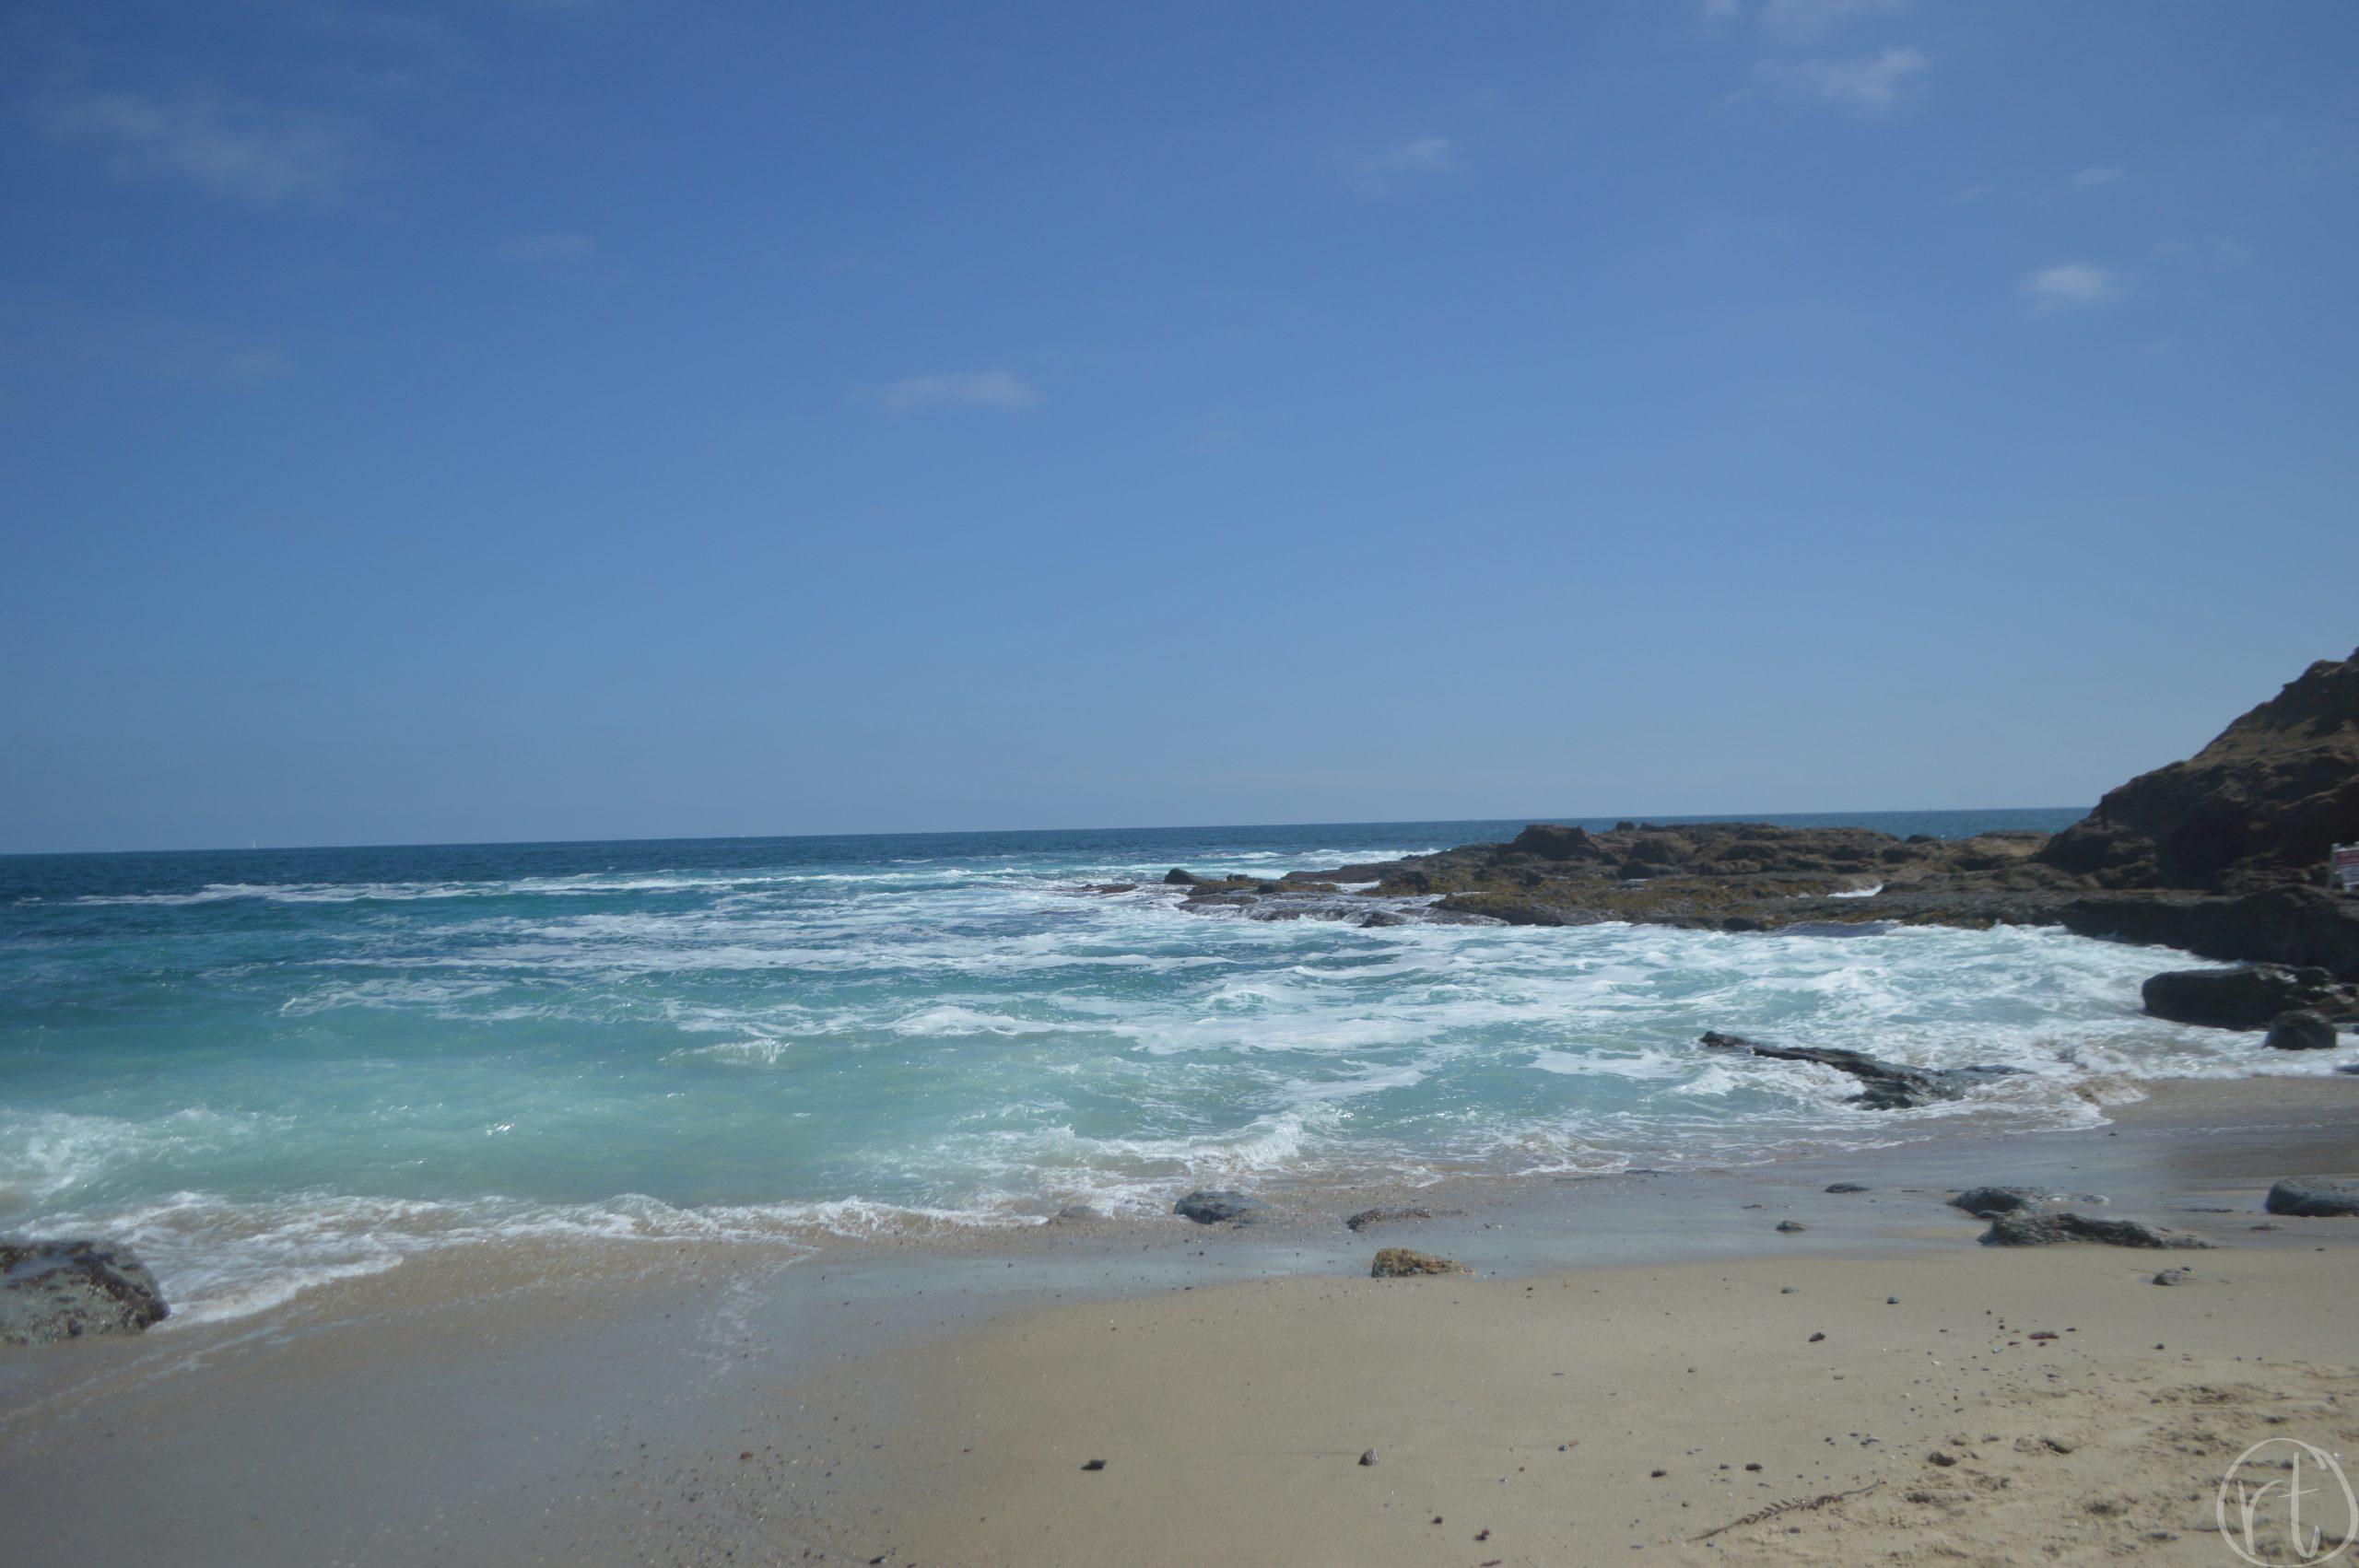 Goff Island Laguna Beach Los Angeles Ocean California.jpg